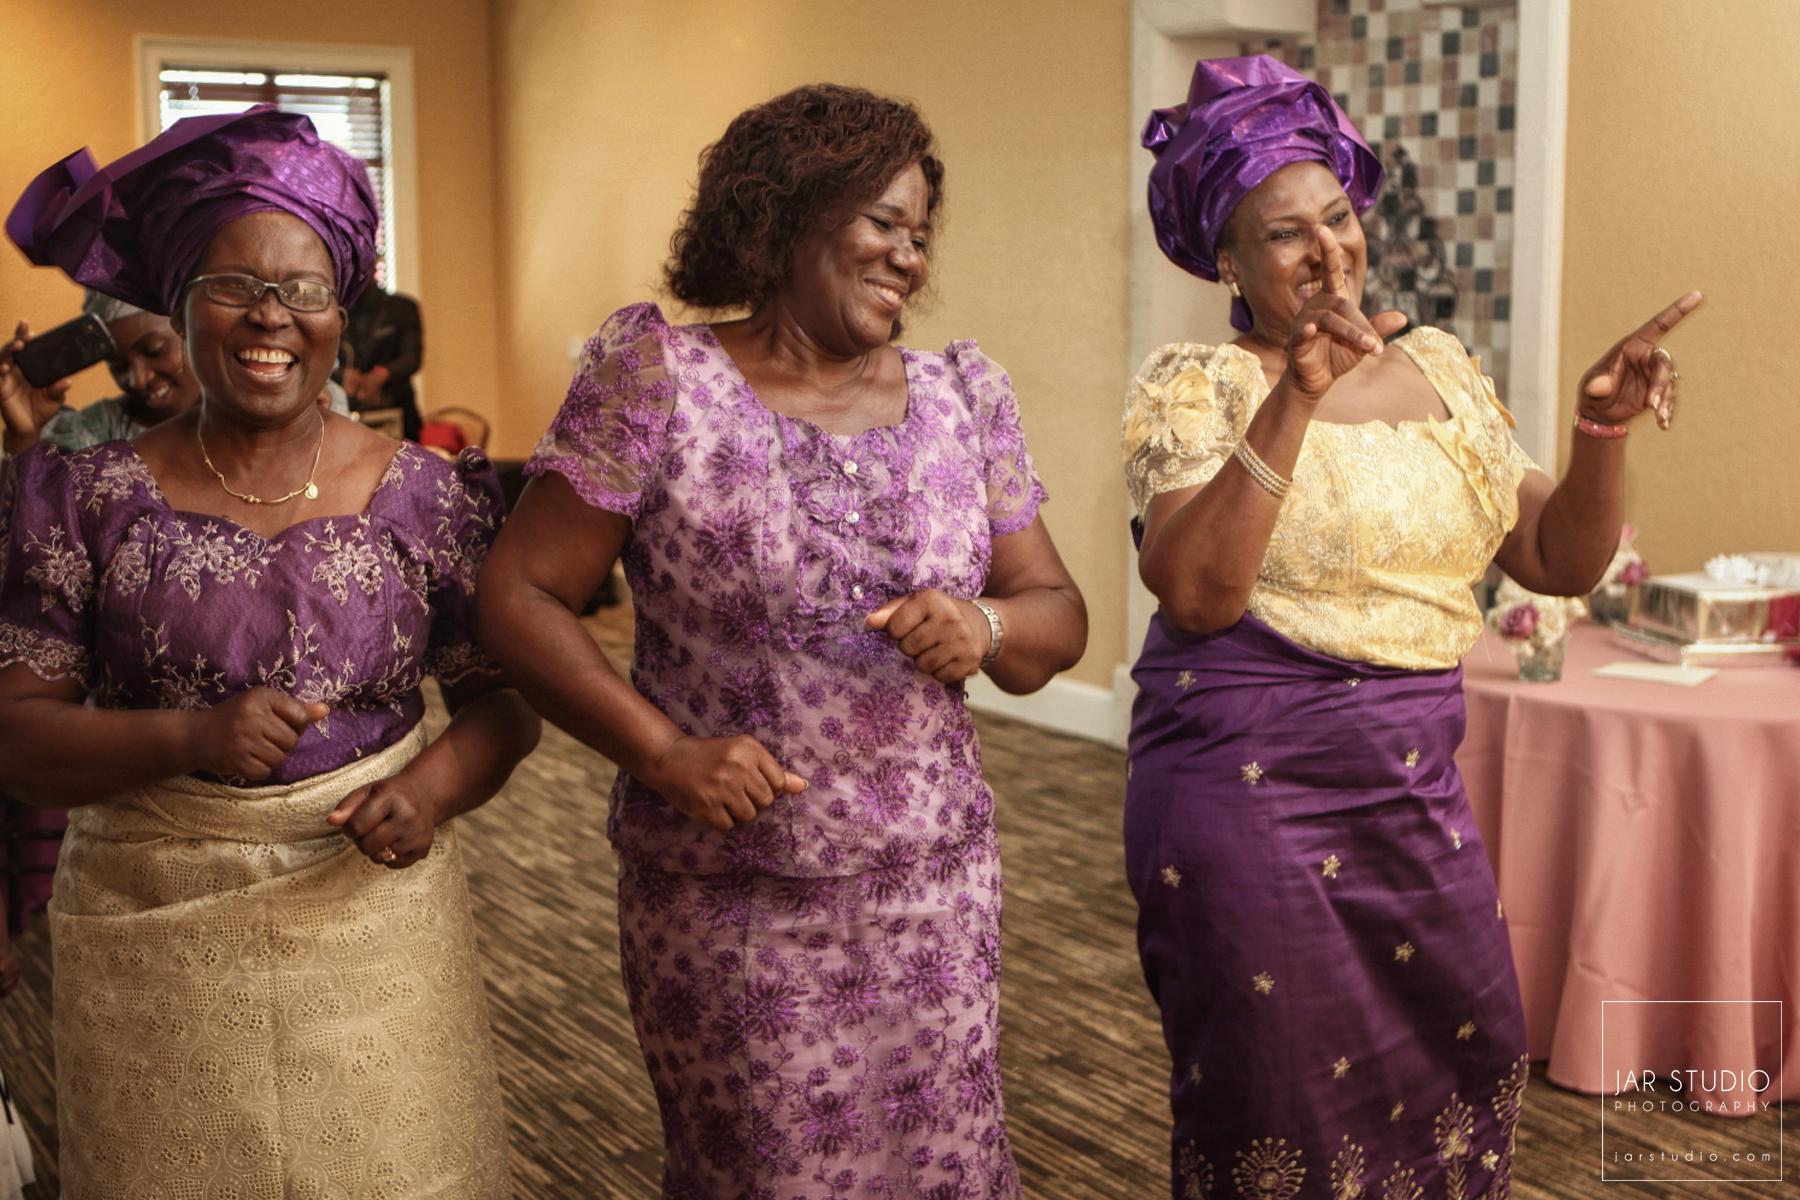 32-nigerian-traditional-dresses-wedding-orlando-photographer-jarstudio.JPG